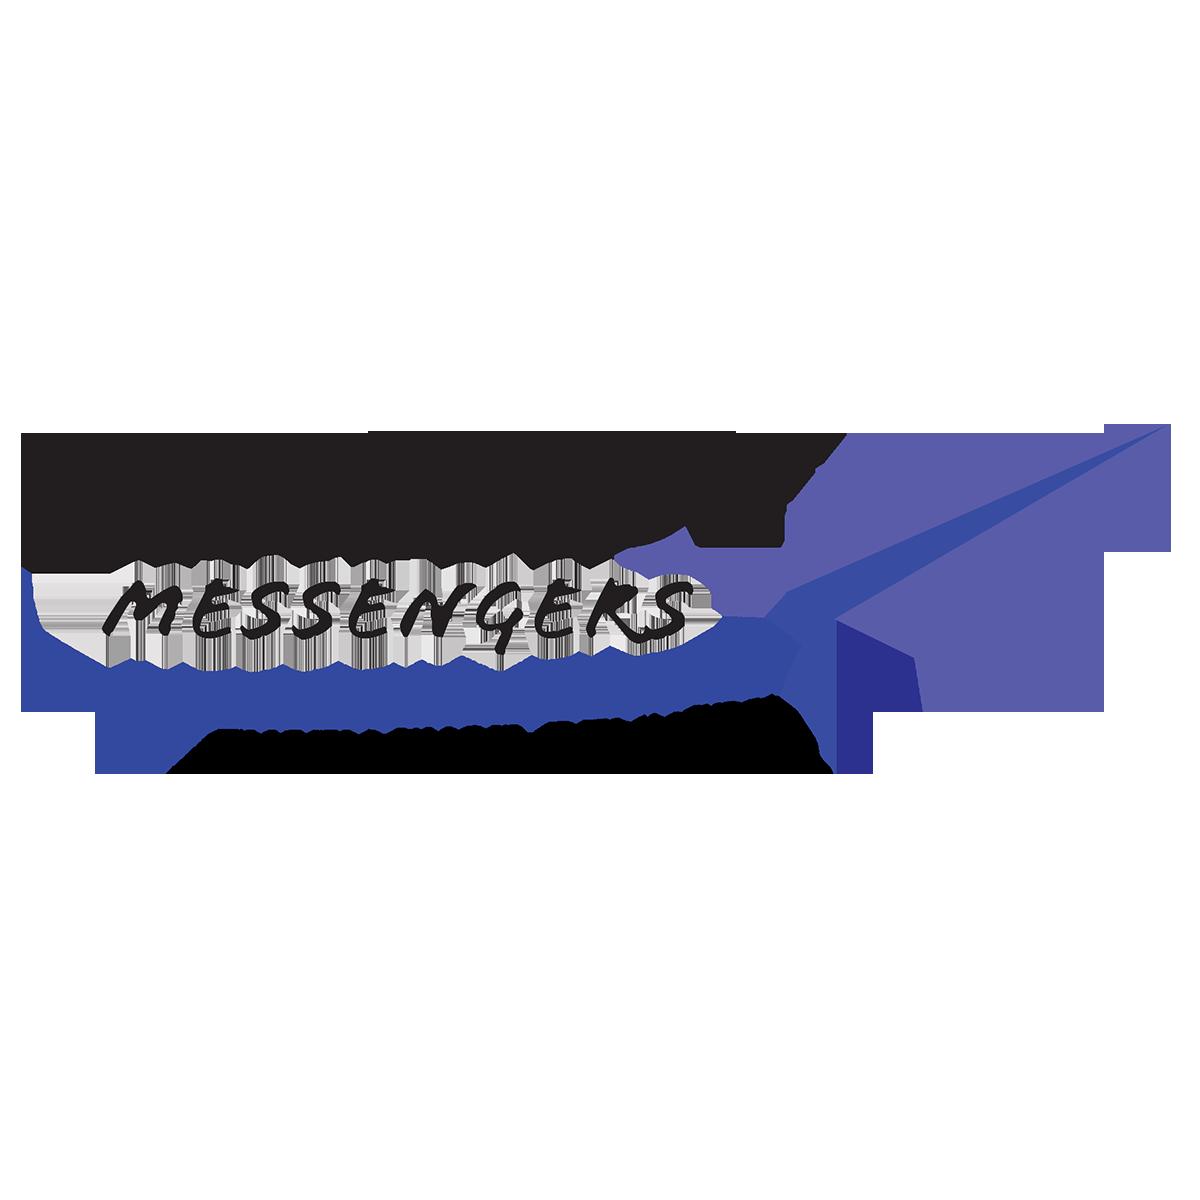 Bayside Messengers